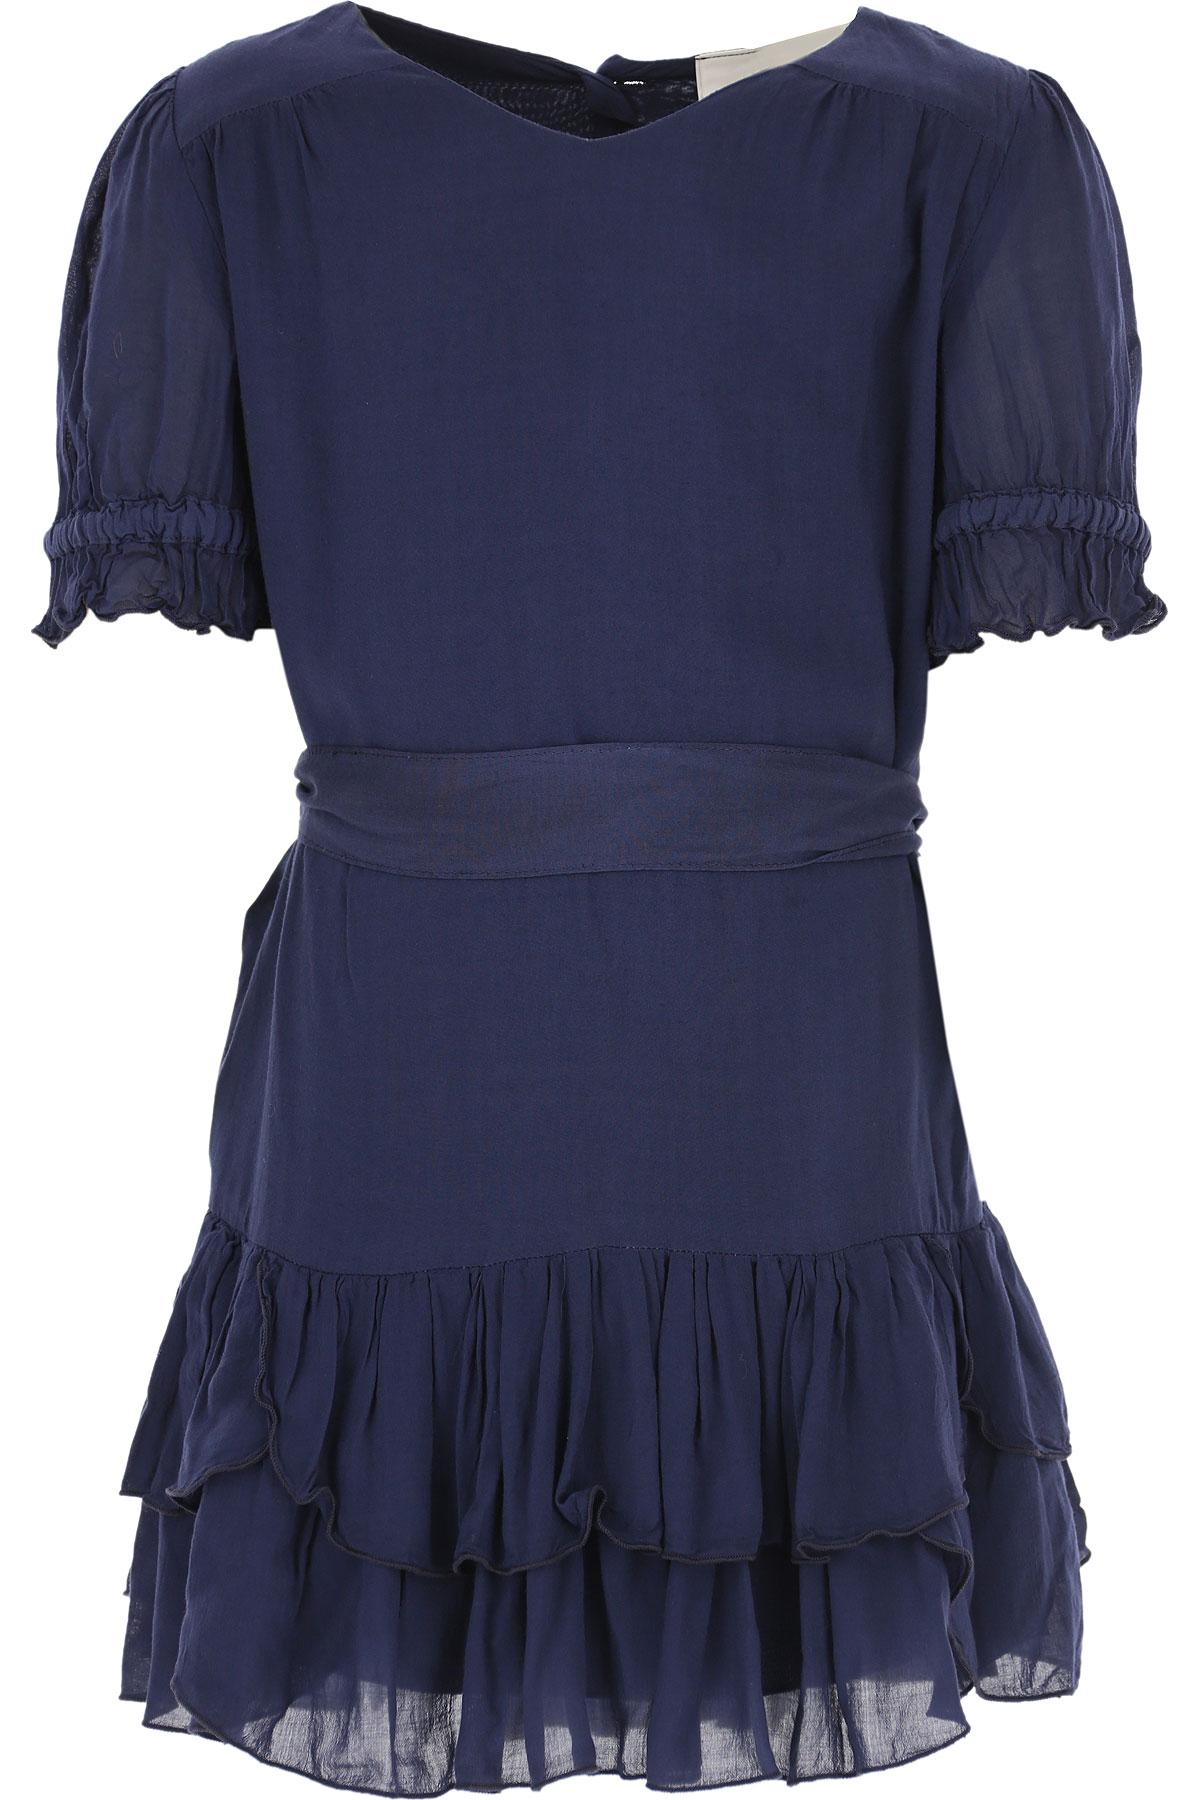 Dondup Girls Dress On Sale in Outlet, Blue, Viscose, 2019, 10Y 6Y